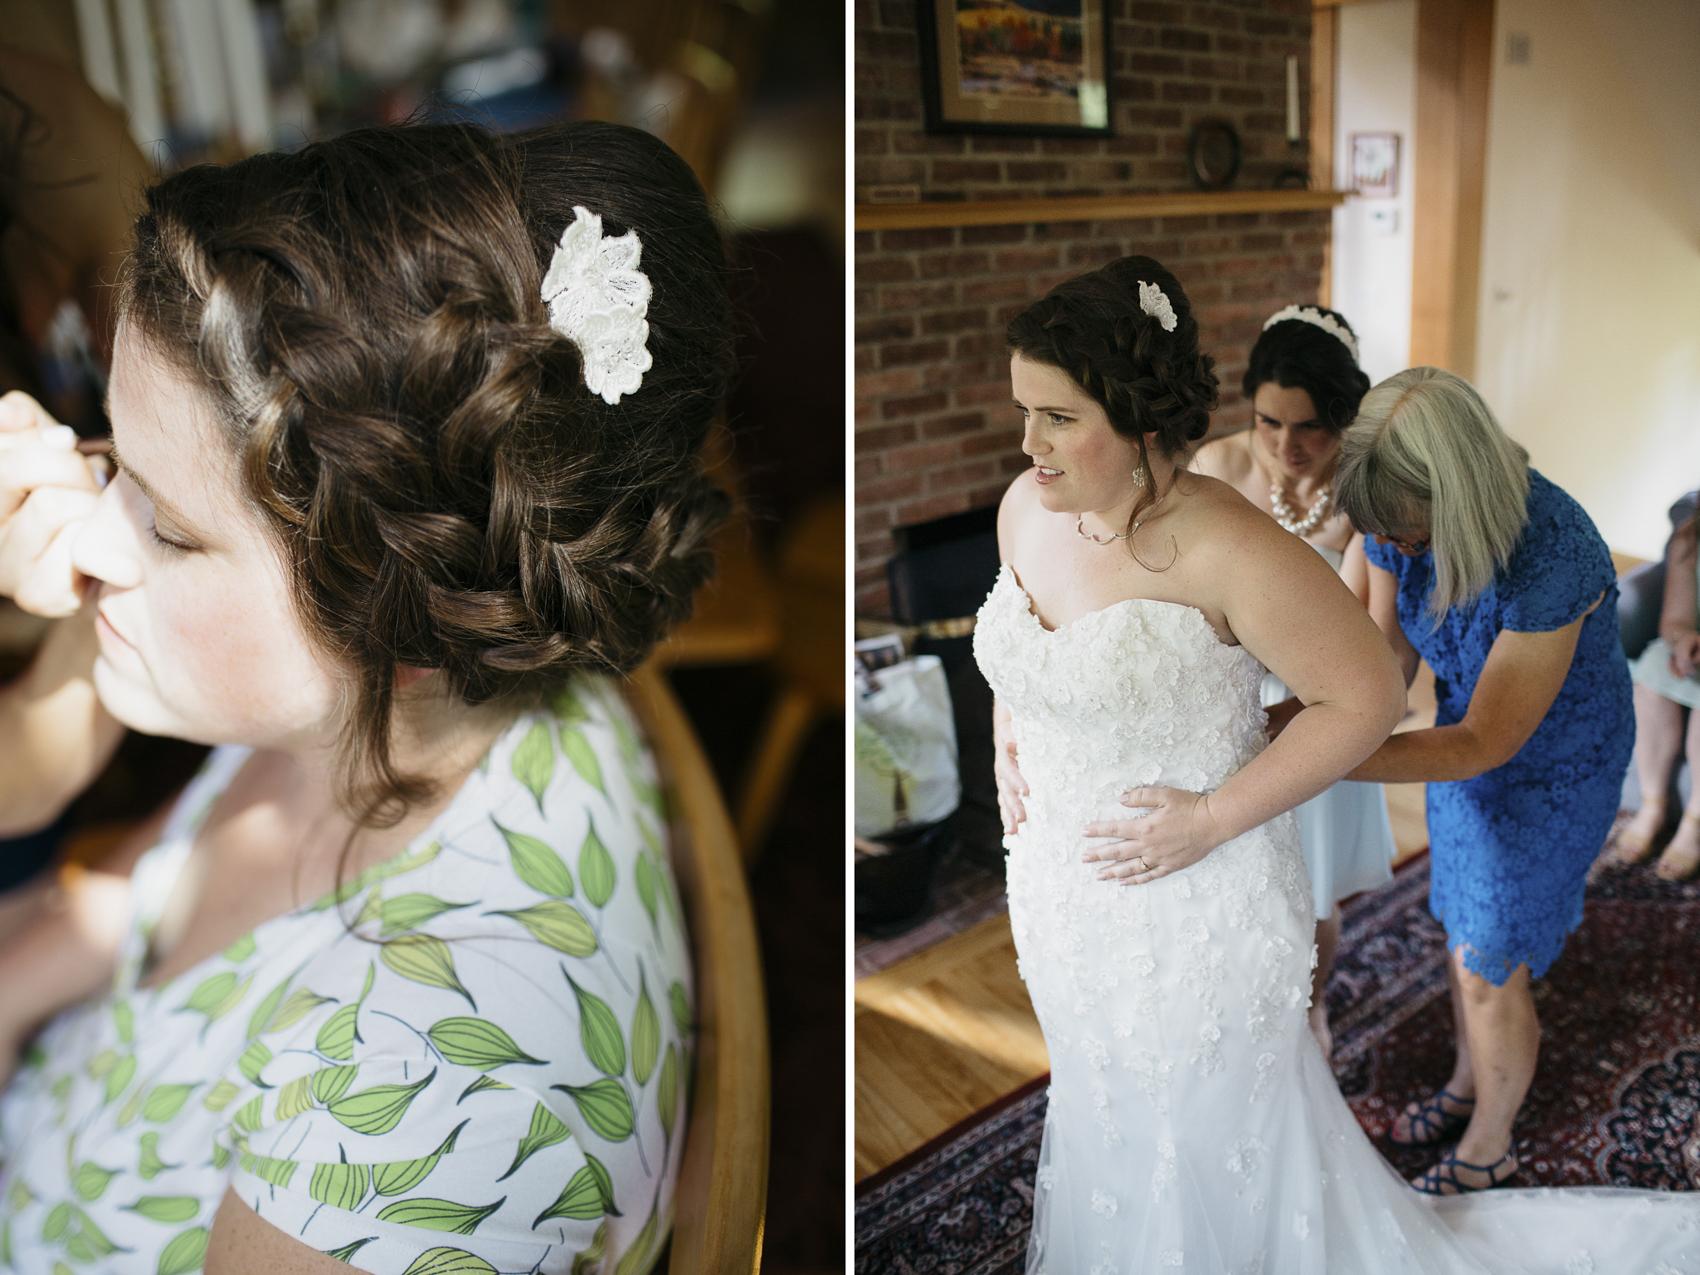 LFA_JuliaGlenn_Sugarloaf_Maine_Wedding002.jpg